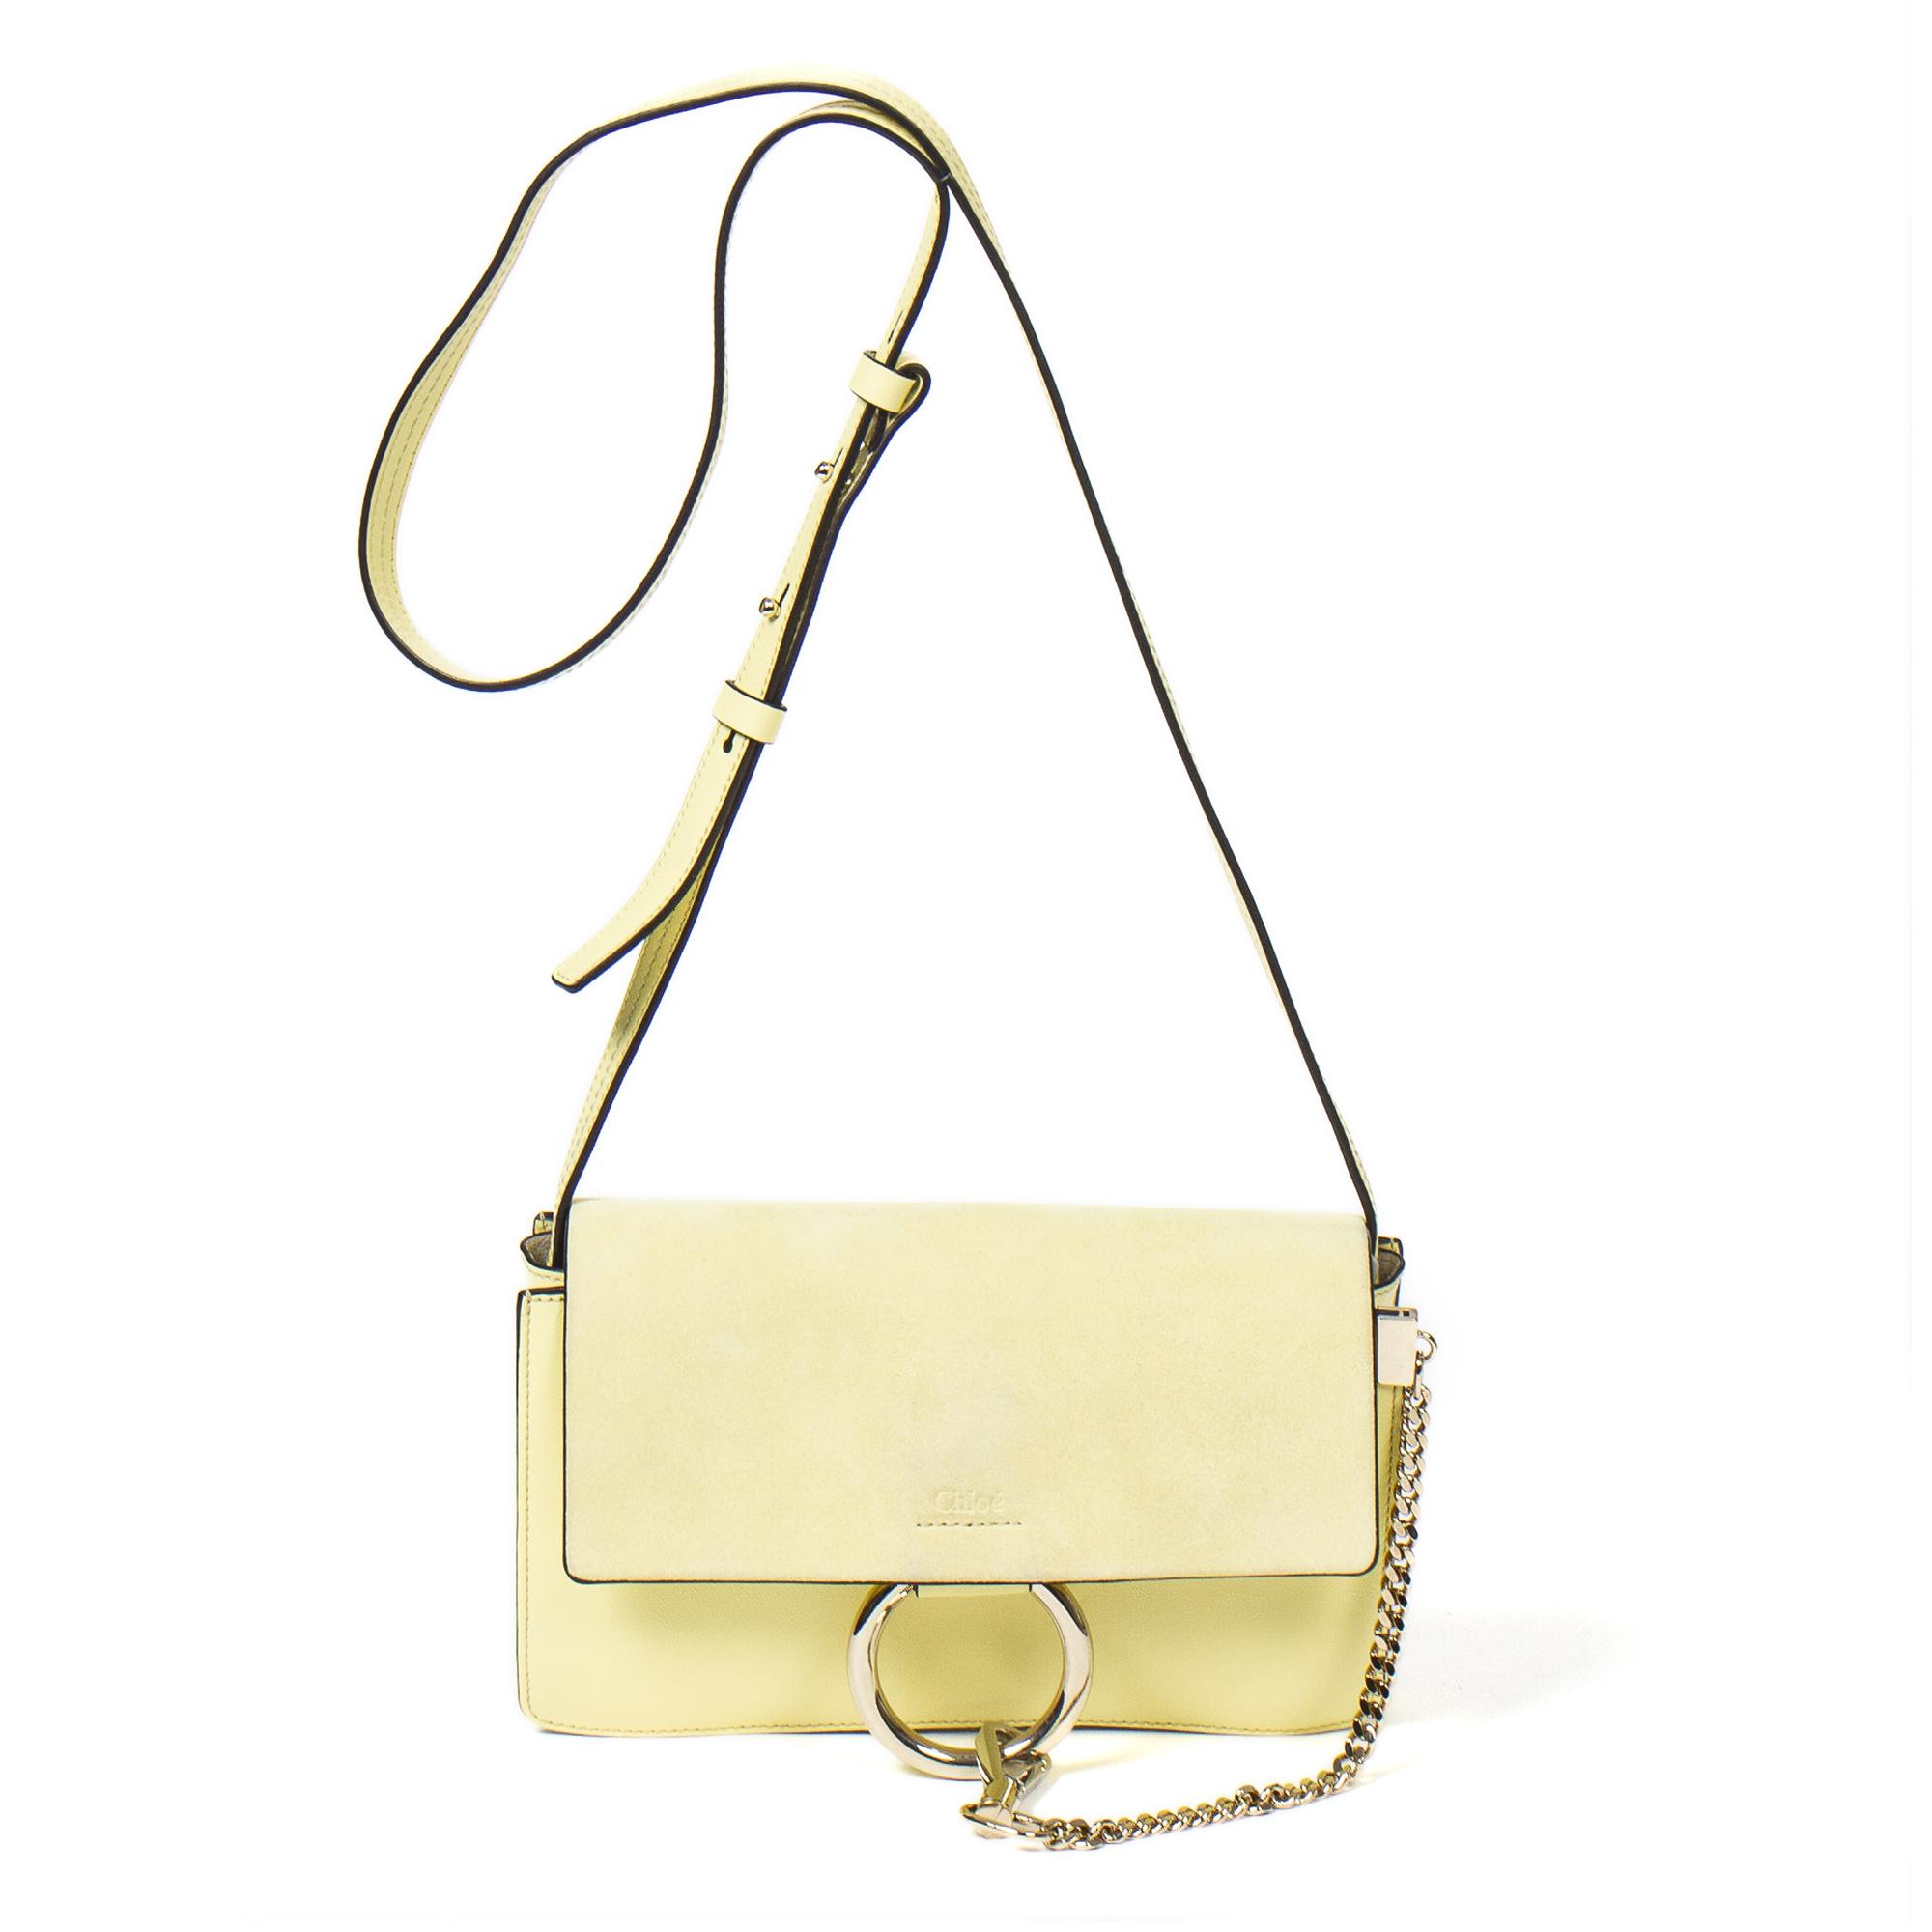 CHLOÉ Hobo Flap Bag Aak6352, Yellow